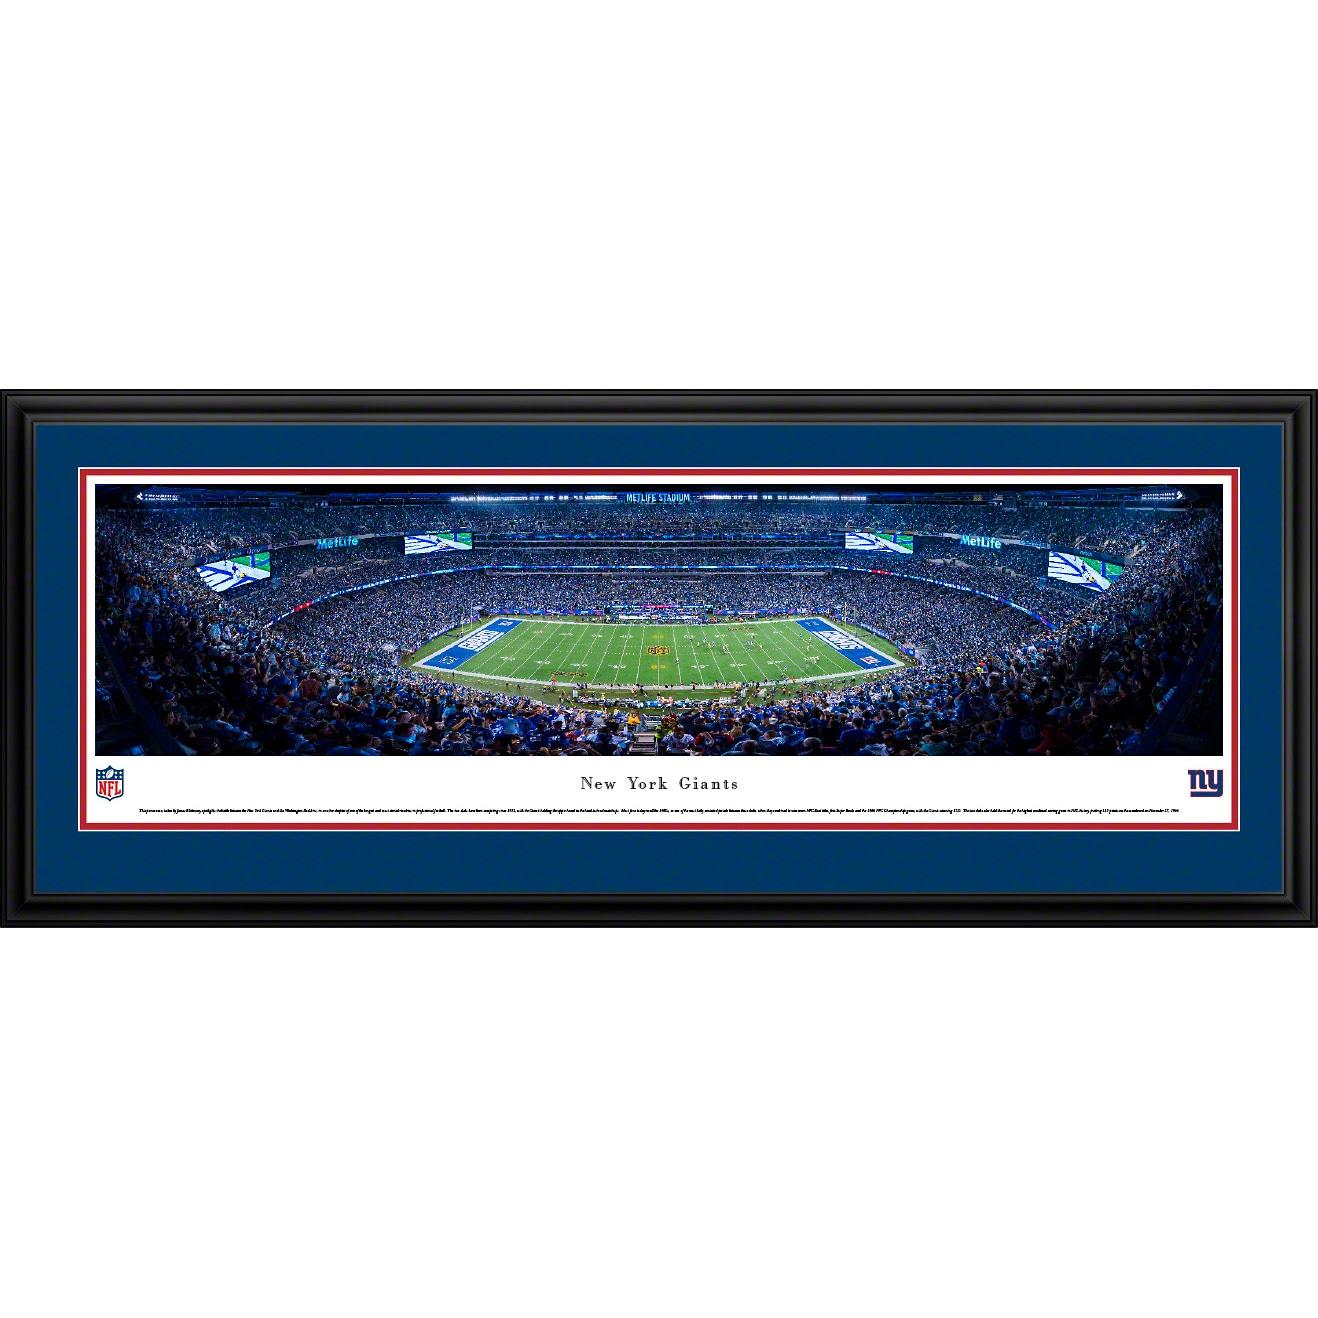 "New York Giants 18"" x 44"" Deluxe Frame Panoramic Photo"